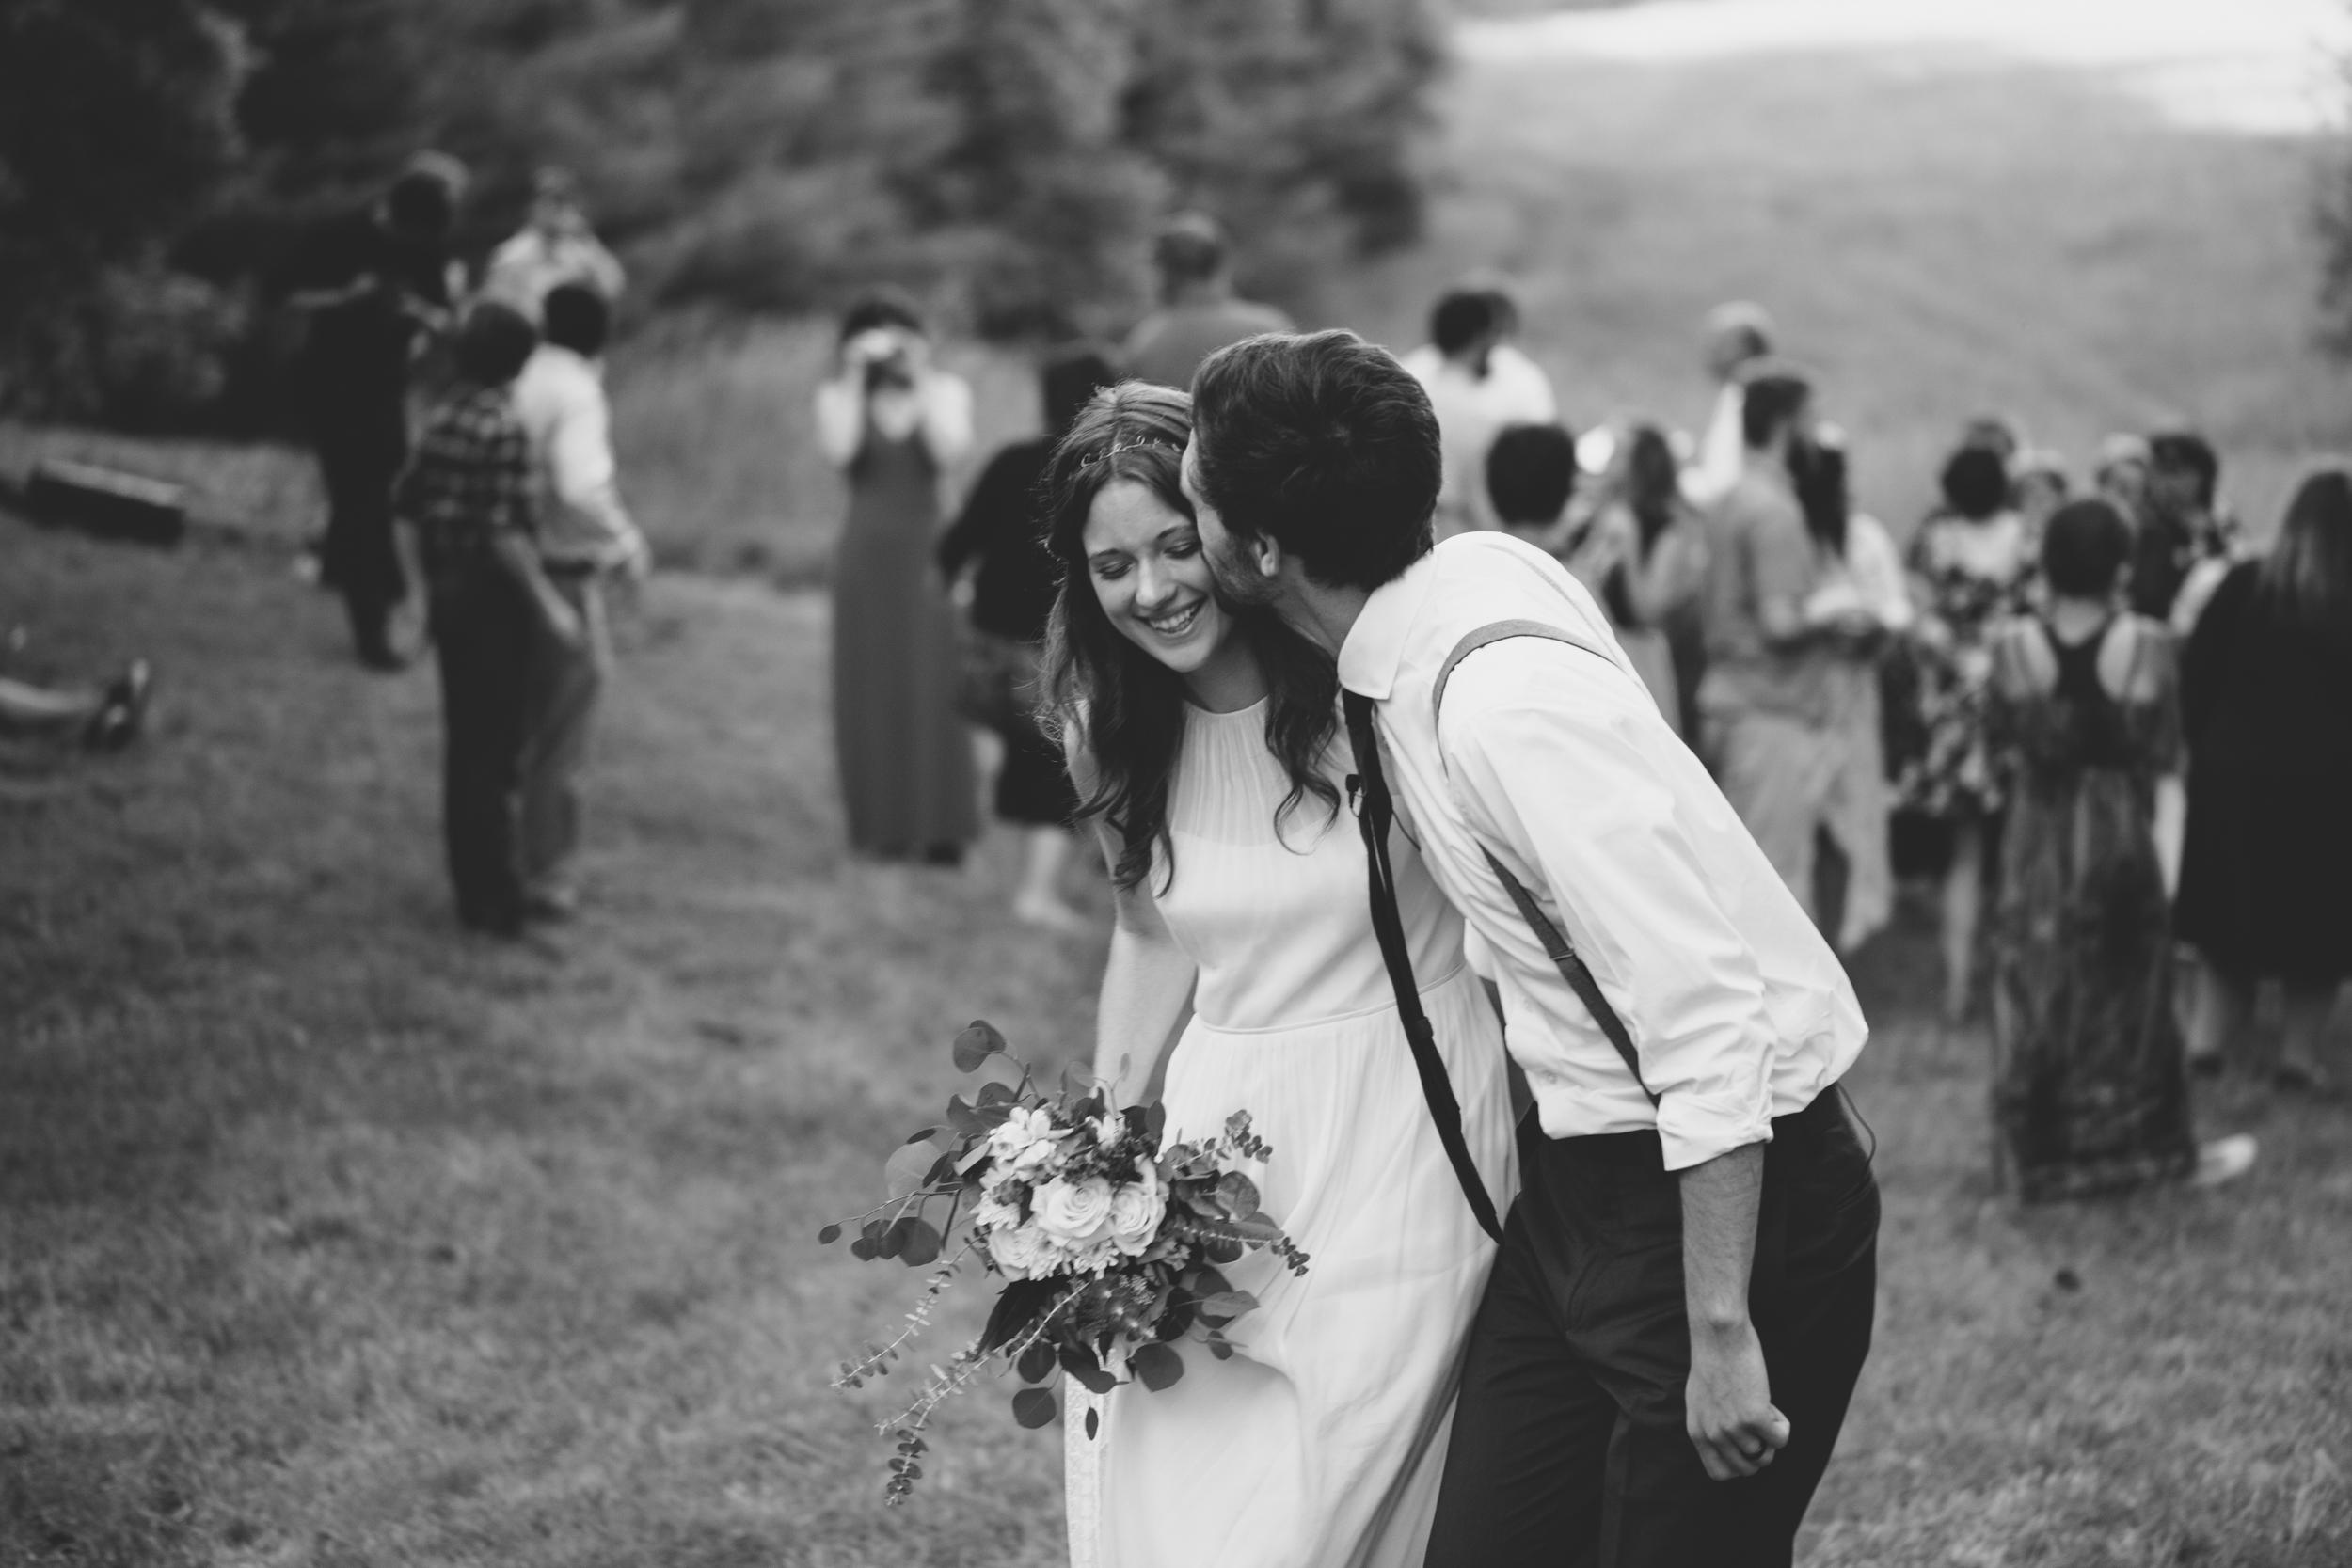 Zack + Hannah Millsaps Wedding in Greenville SC Nashville Wedding Photographer Photography Anthology-77.jpg